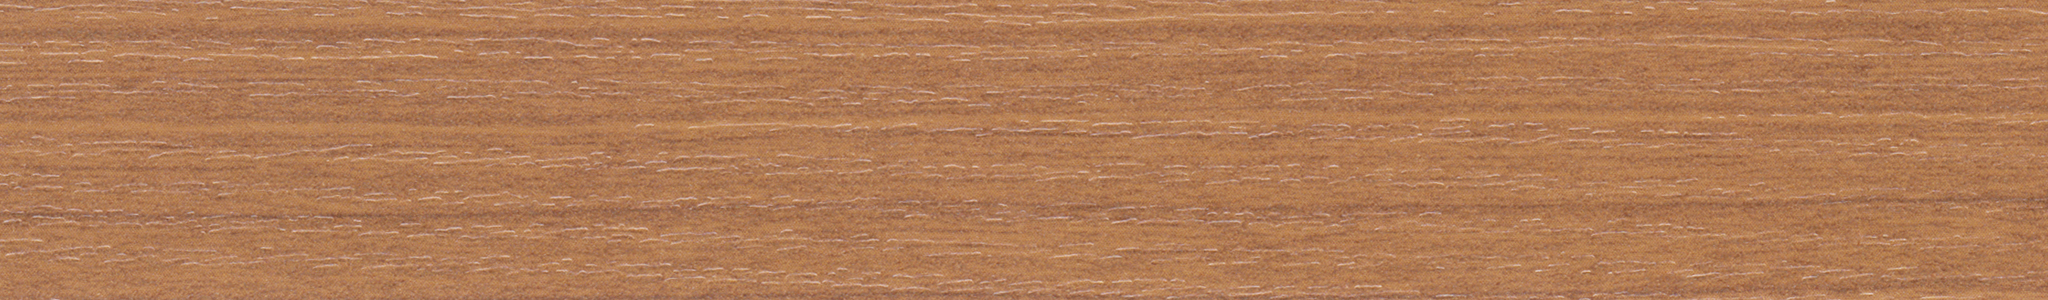 HD 42507 lamino hrana třešeň gravír